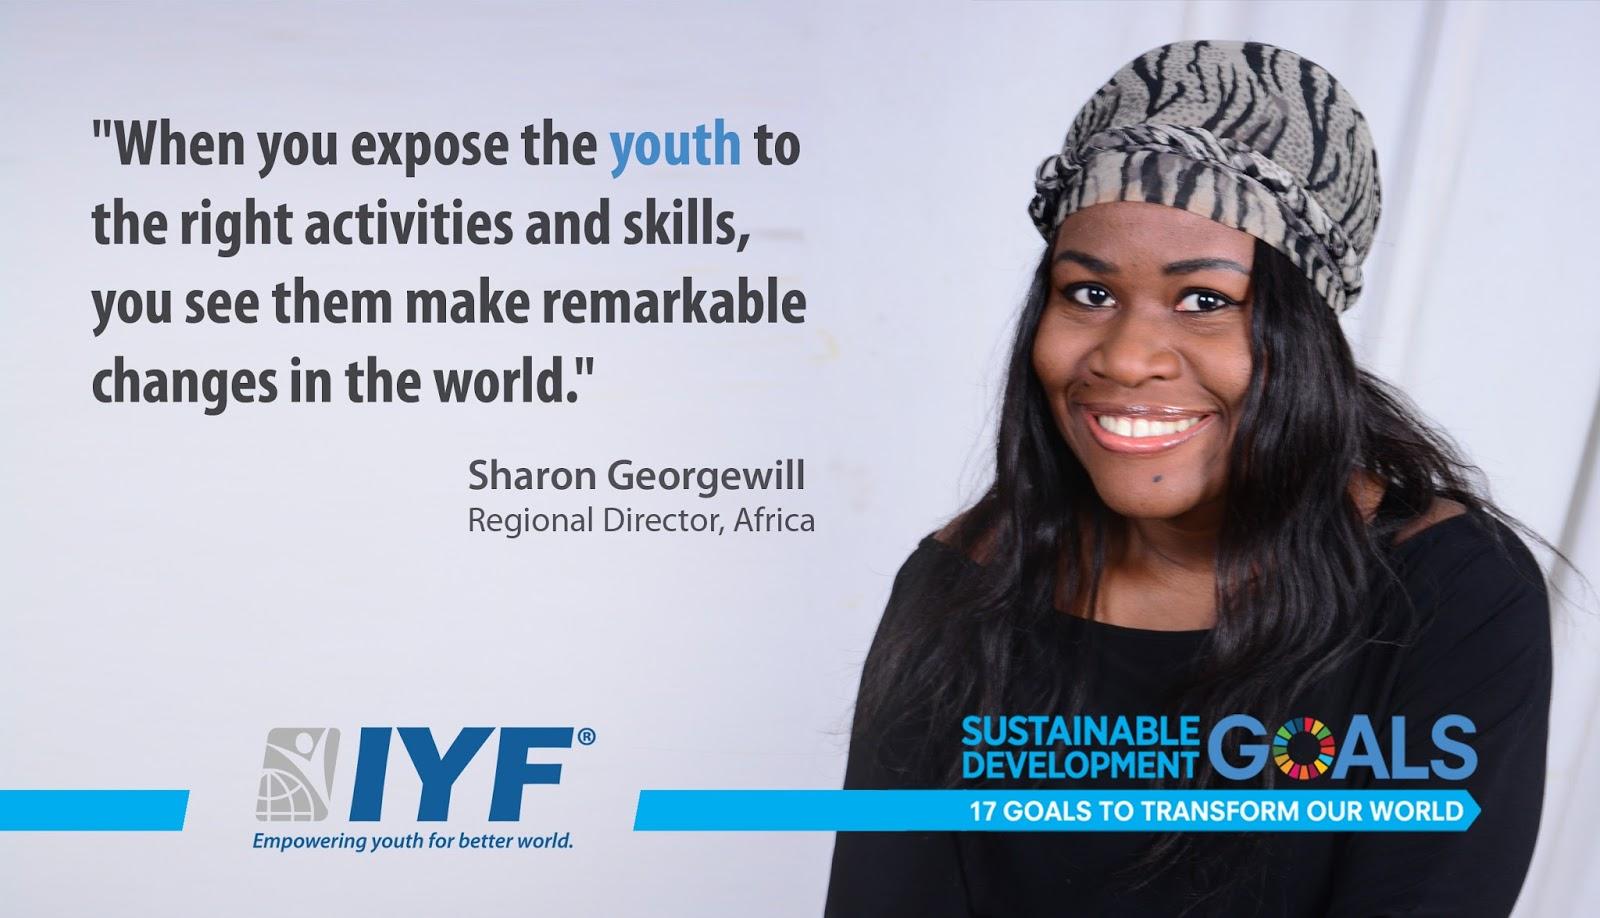 Sharon Georgewill, Regional Director, Africa